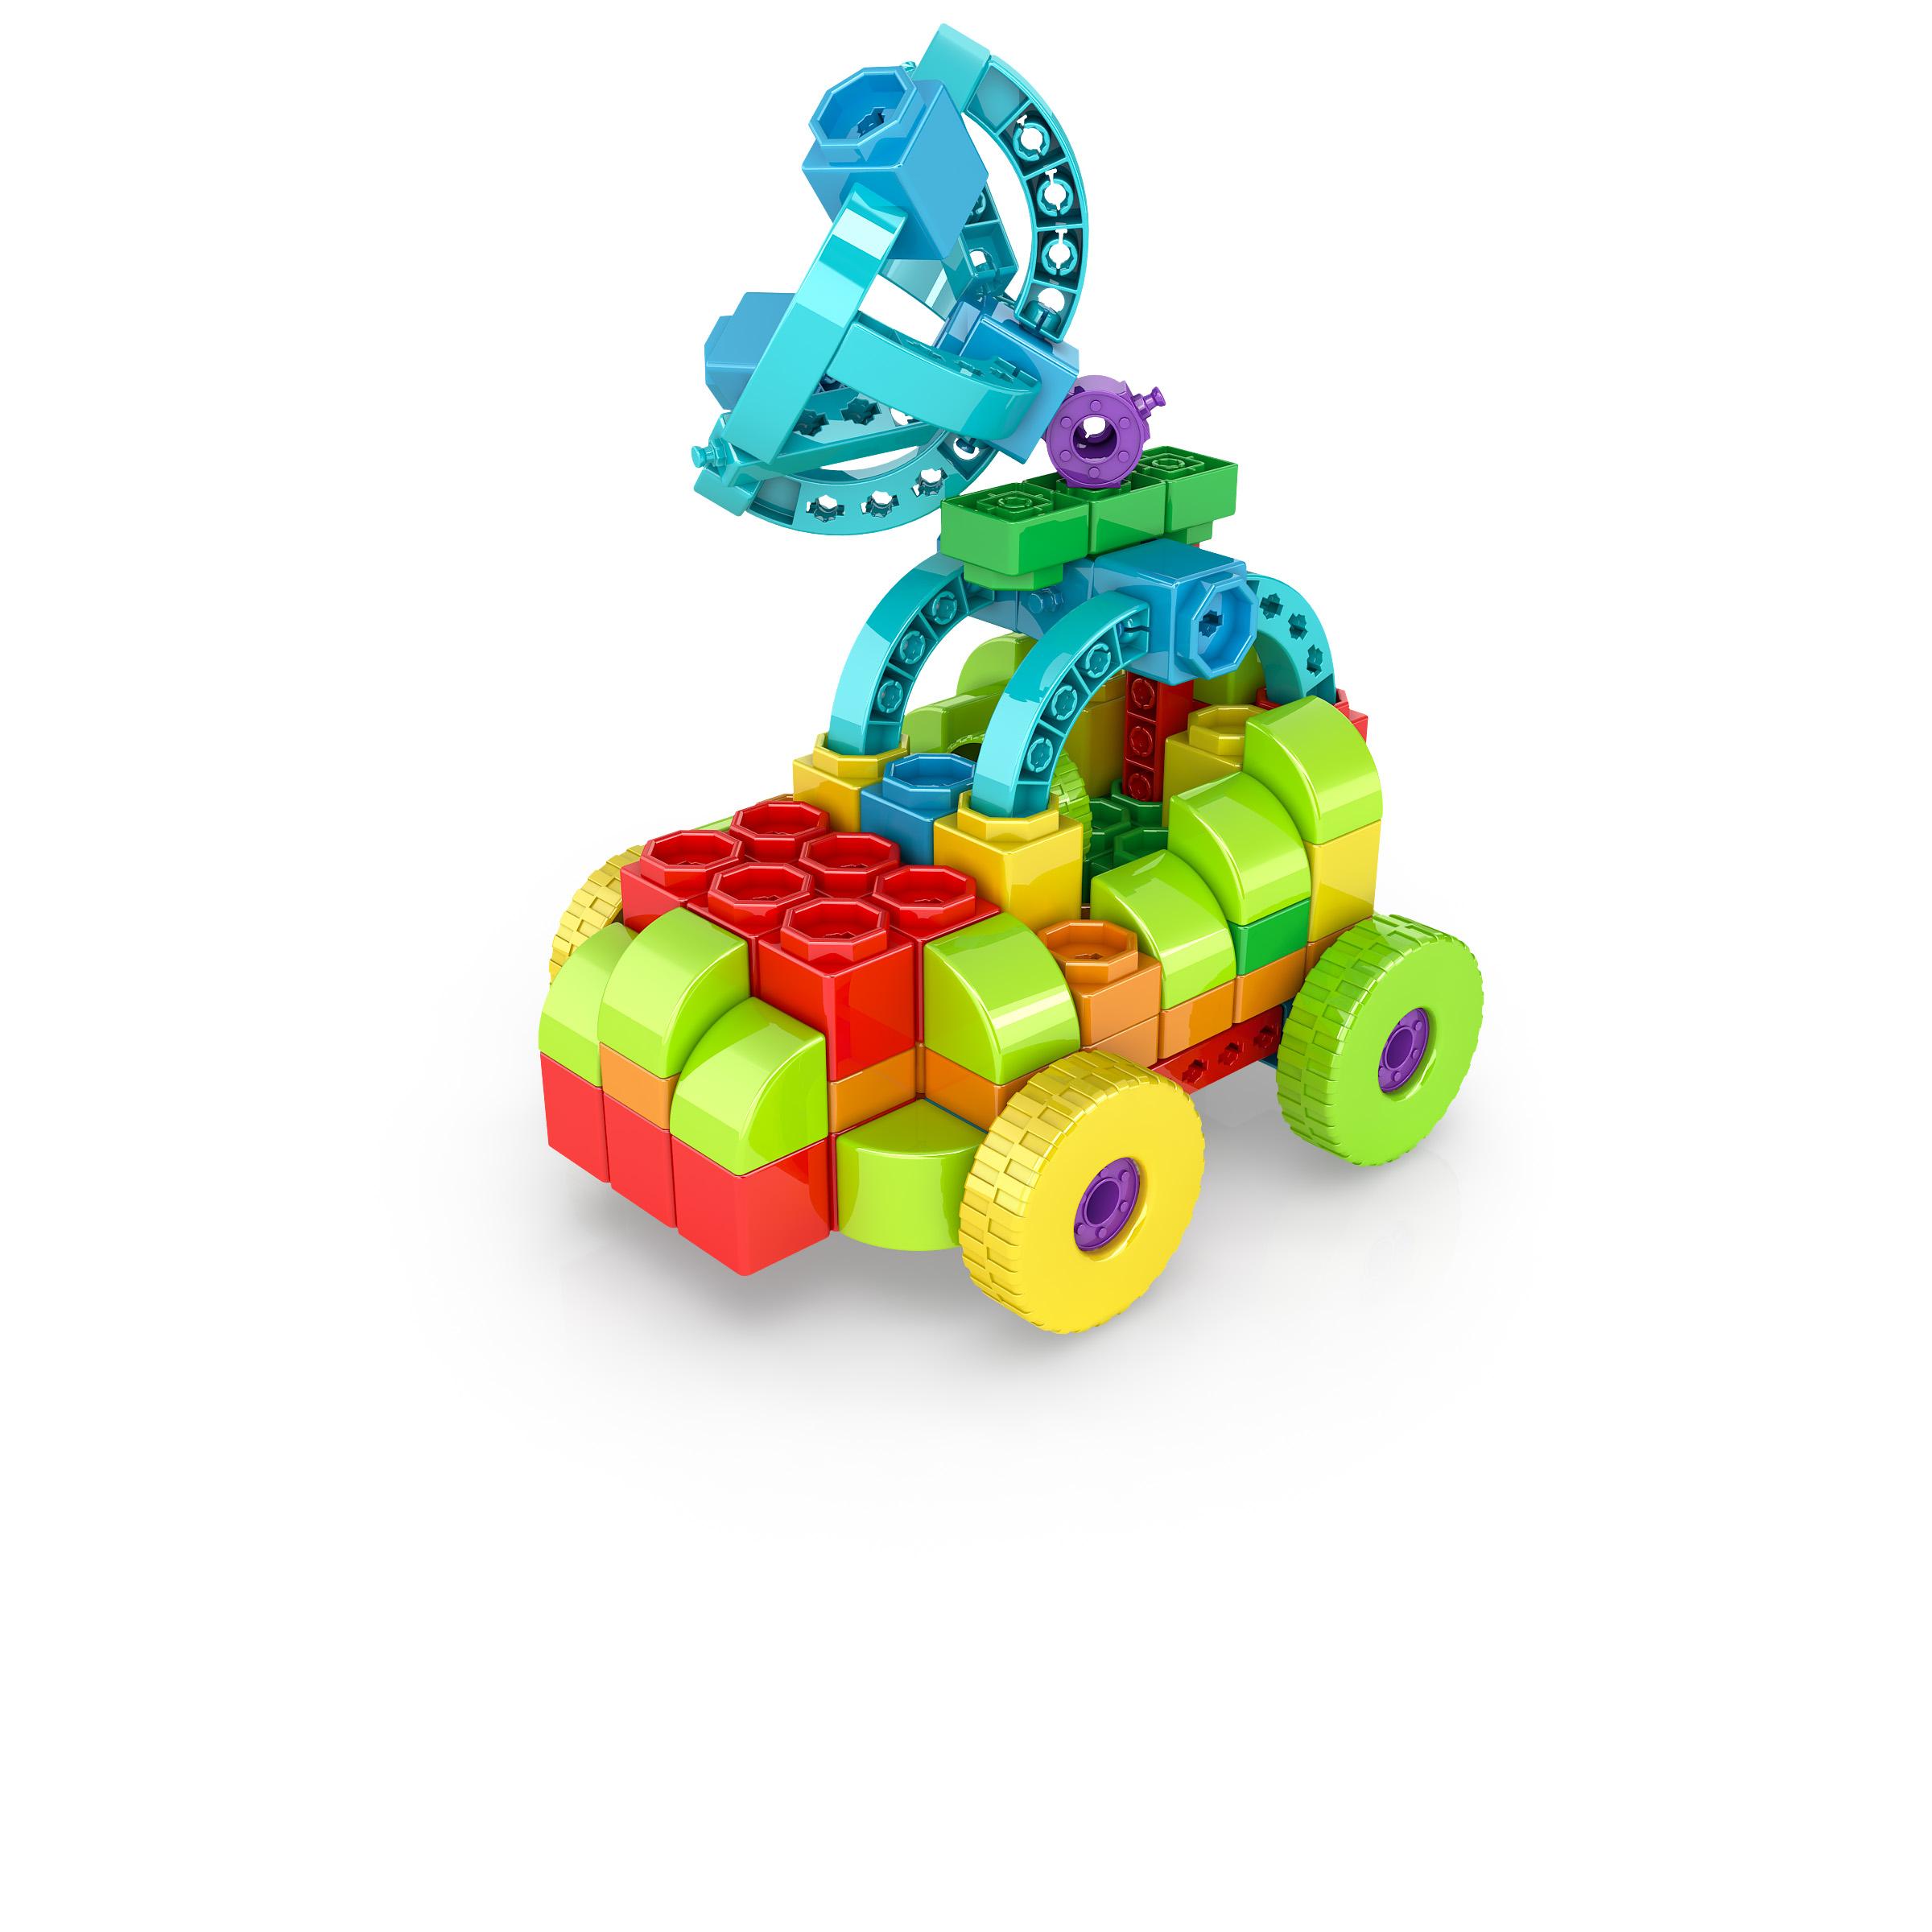 , SateliteCar 1, משחקי חשיבה לילדים engino, משחקים לגיל הרך playgro, משחק הרכבות אנג'ינו, משחקי רכבות